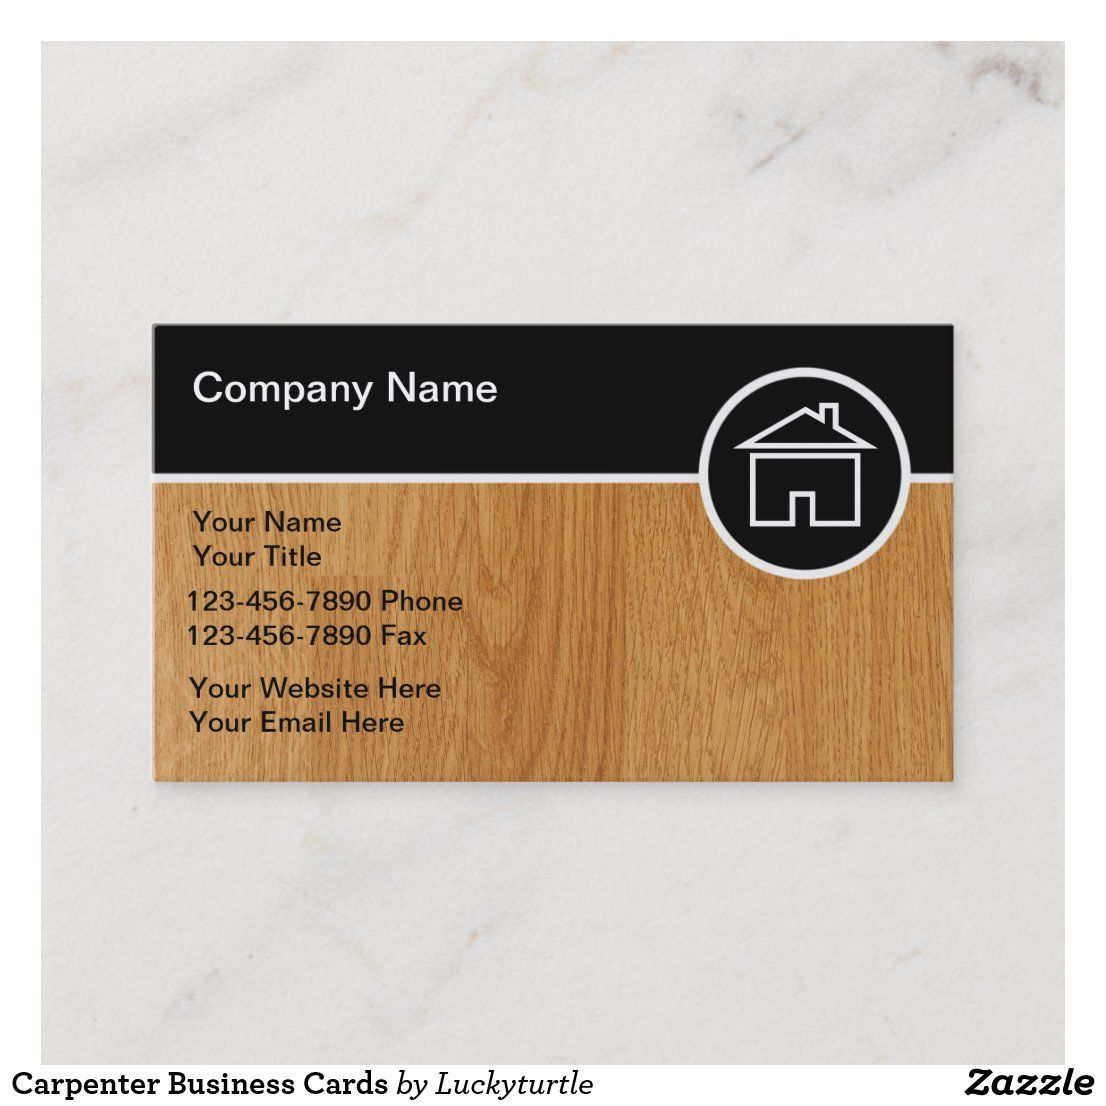 Carpenter Business Cards Zazzle Com Construction Business Cards Business Card Template Design Business Card Design Simple